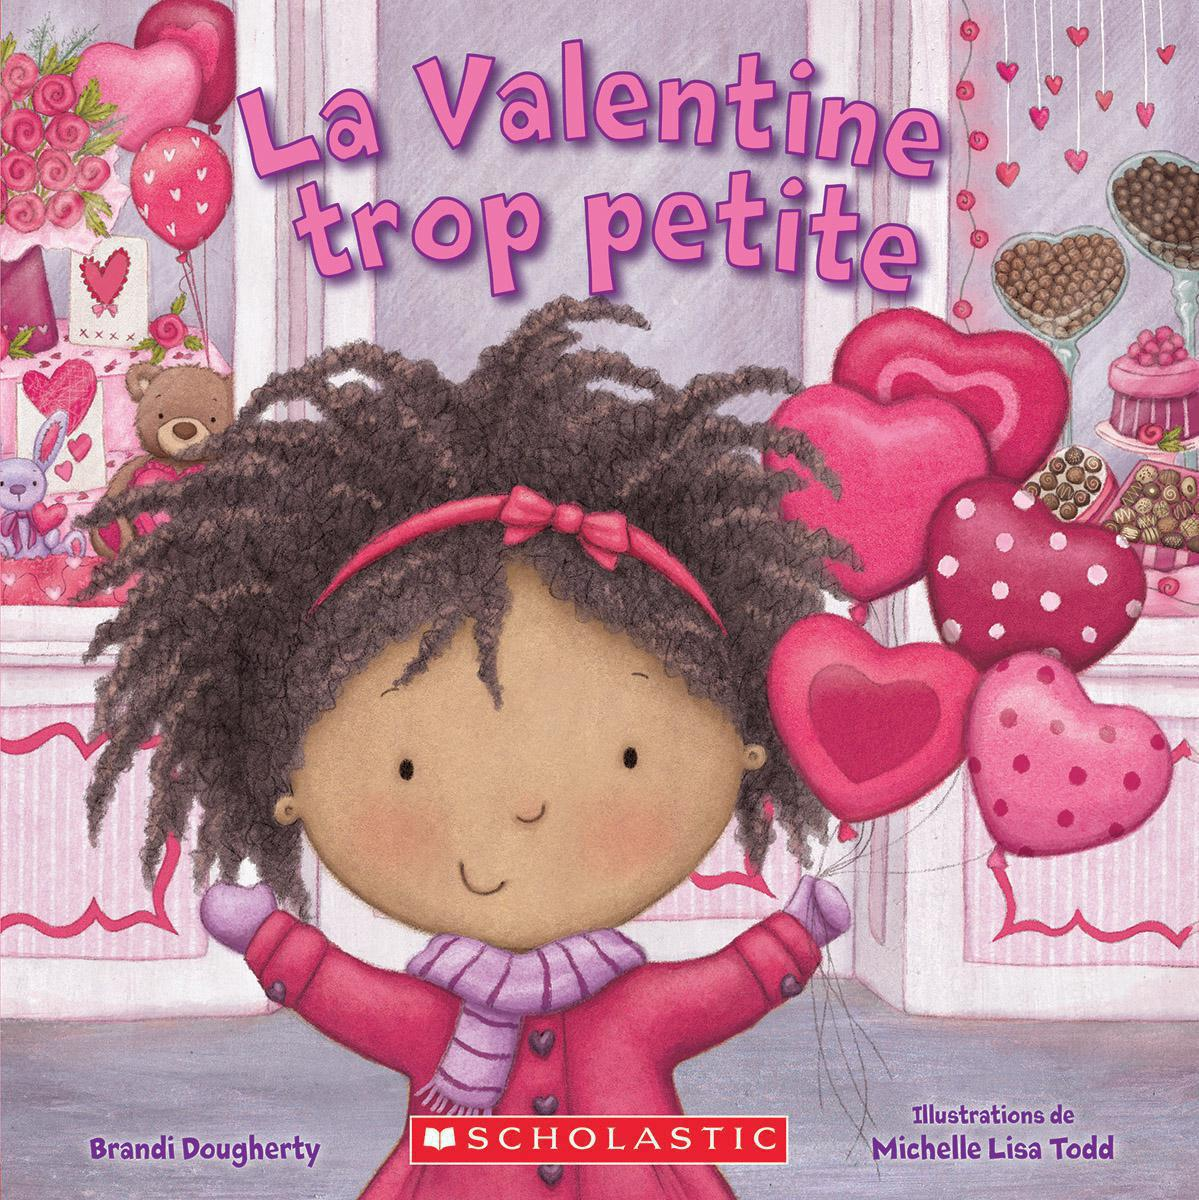 La Valentine trop petite